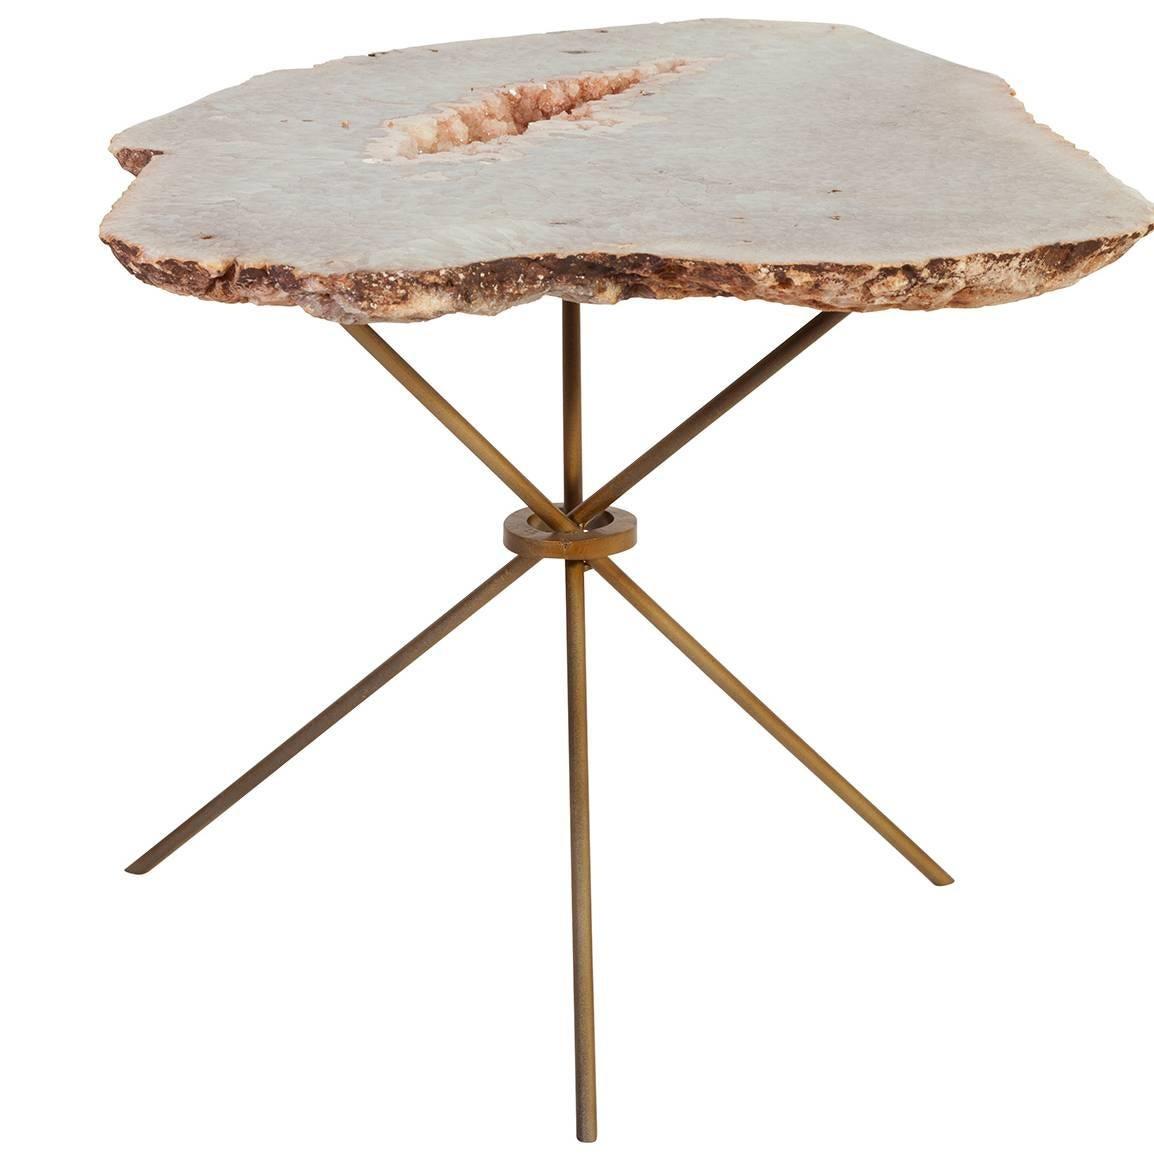 rose quartz agate side table for sale at 1stdibs rh 1stdibs com agate side table west elm agate side table west elm